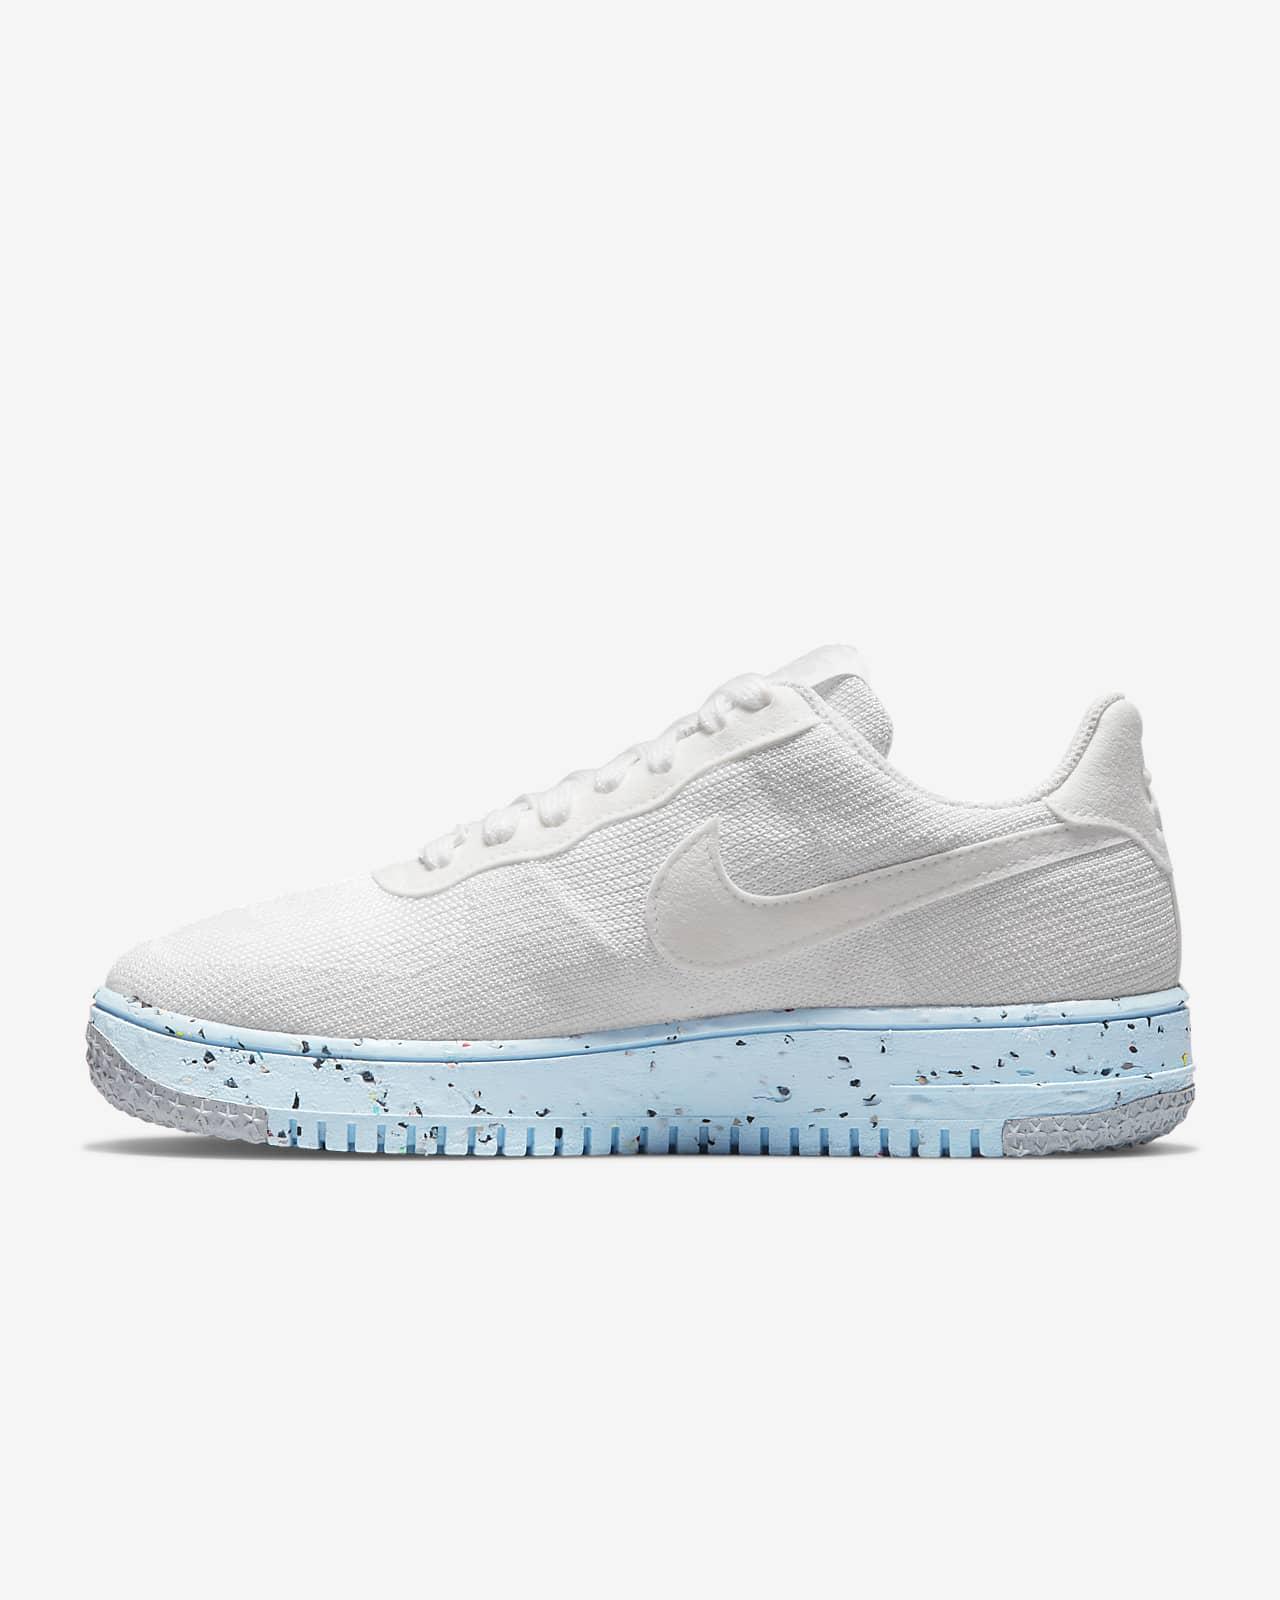 Nike Air Force 1 Crater FlyKnit Women's Shoe